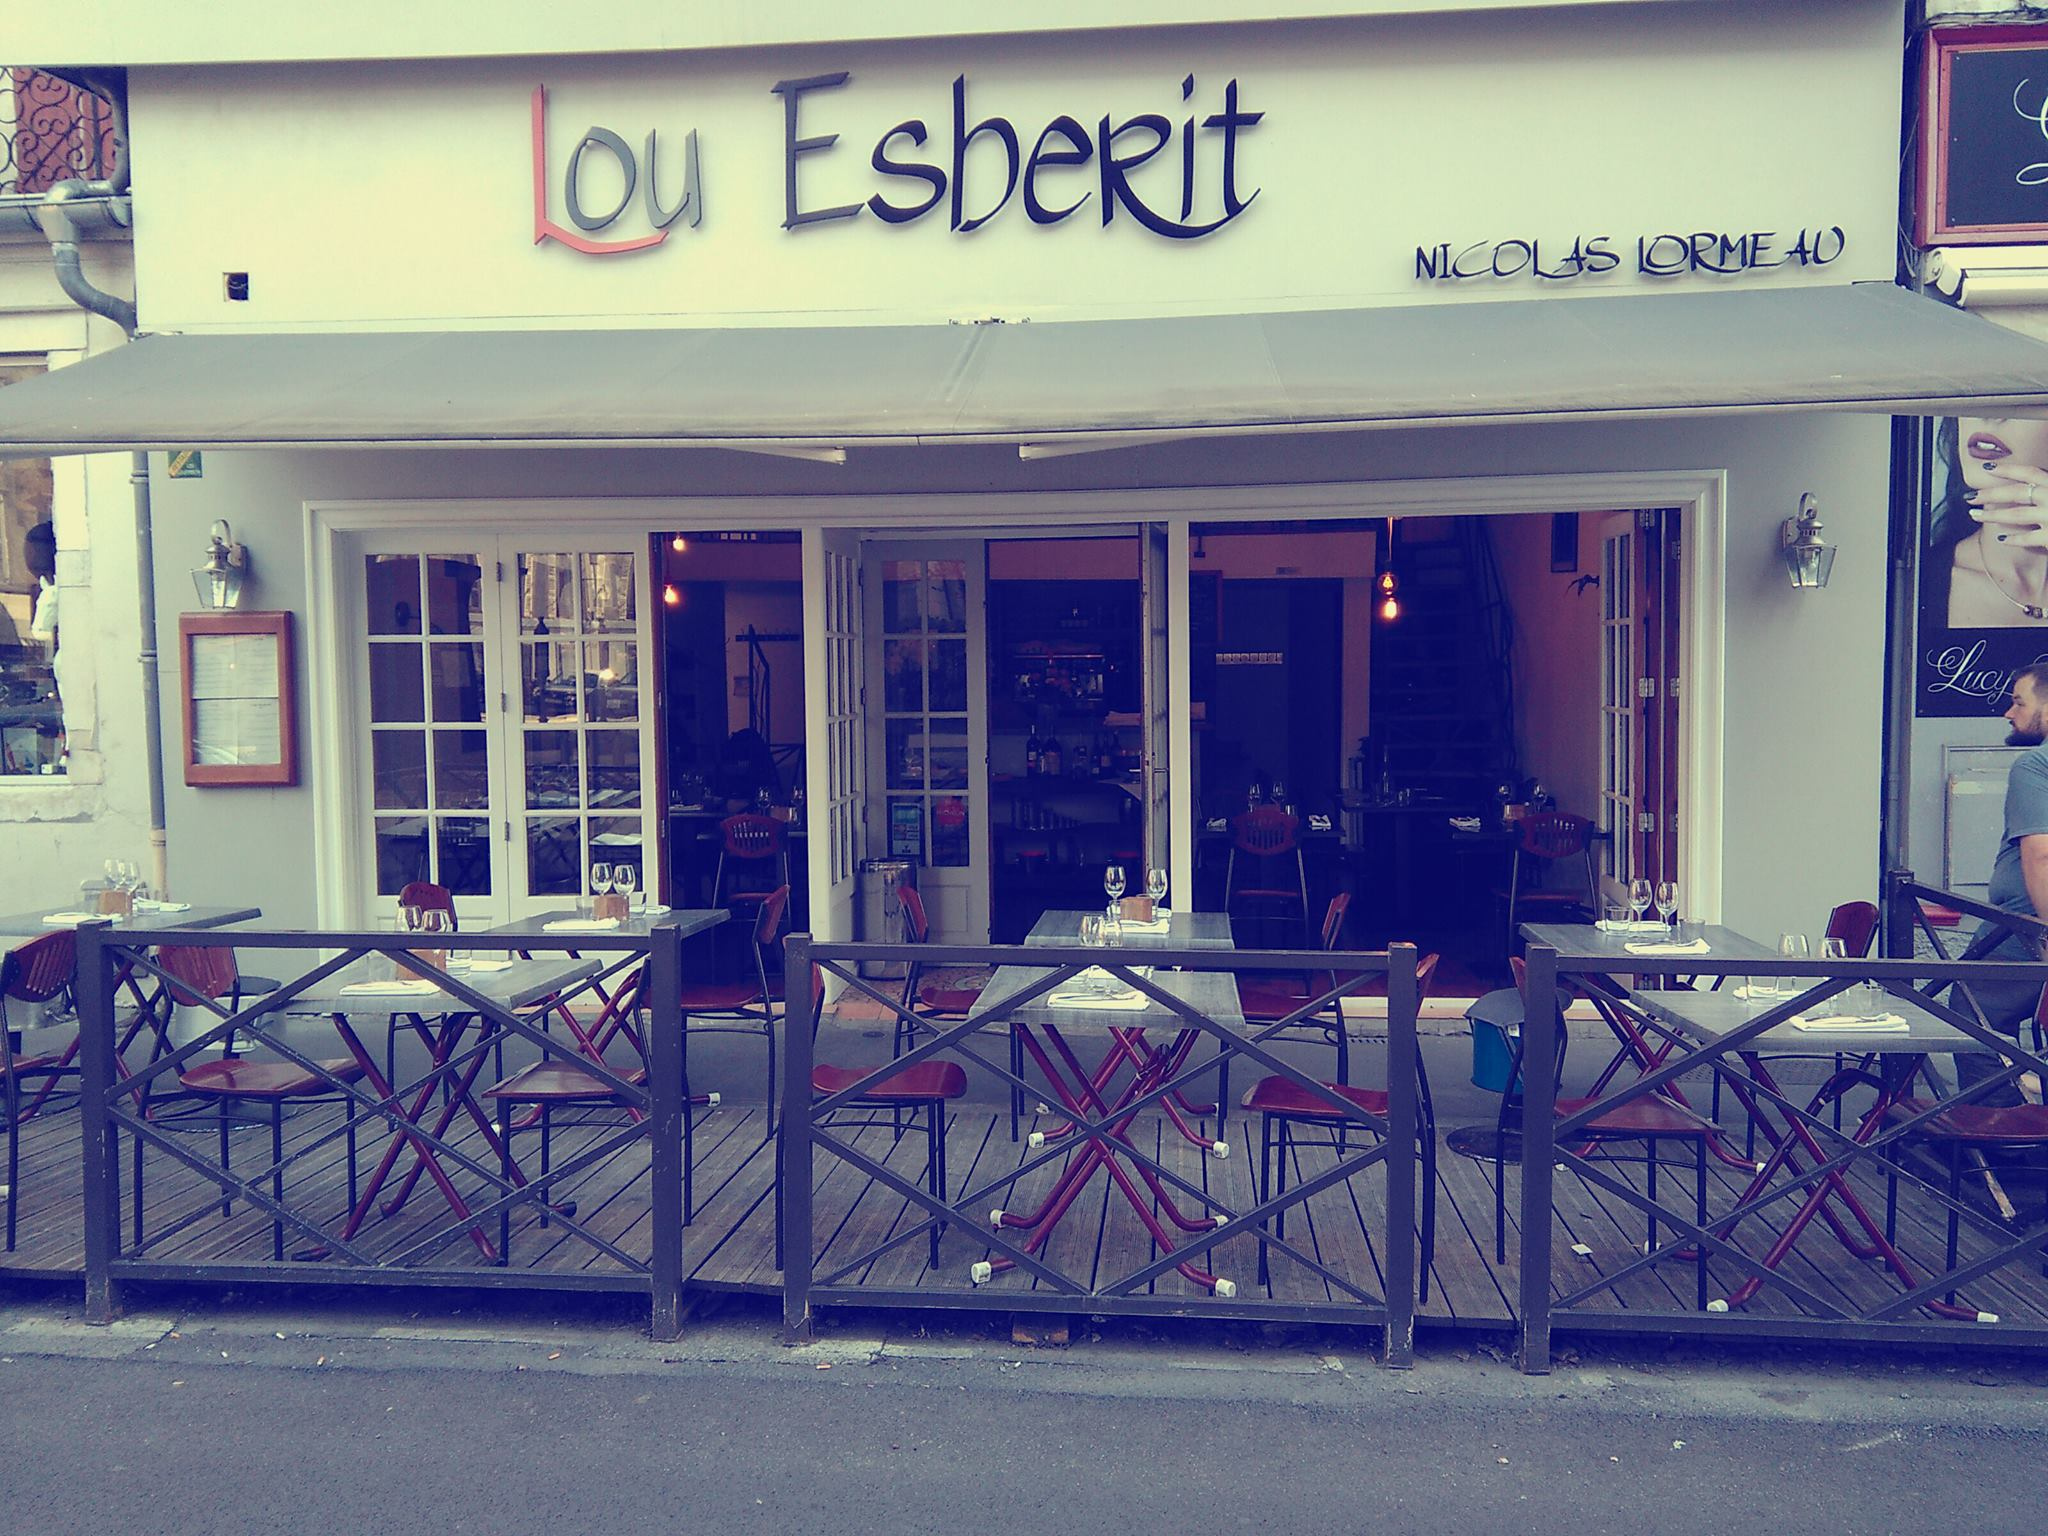 Adhérent LOU ESBERIT - photo #12311